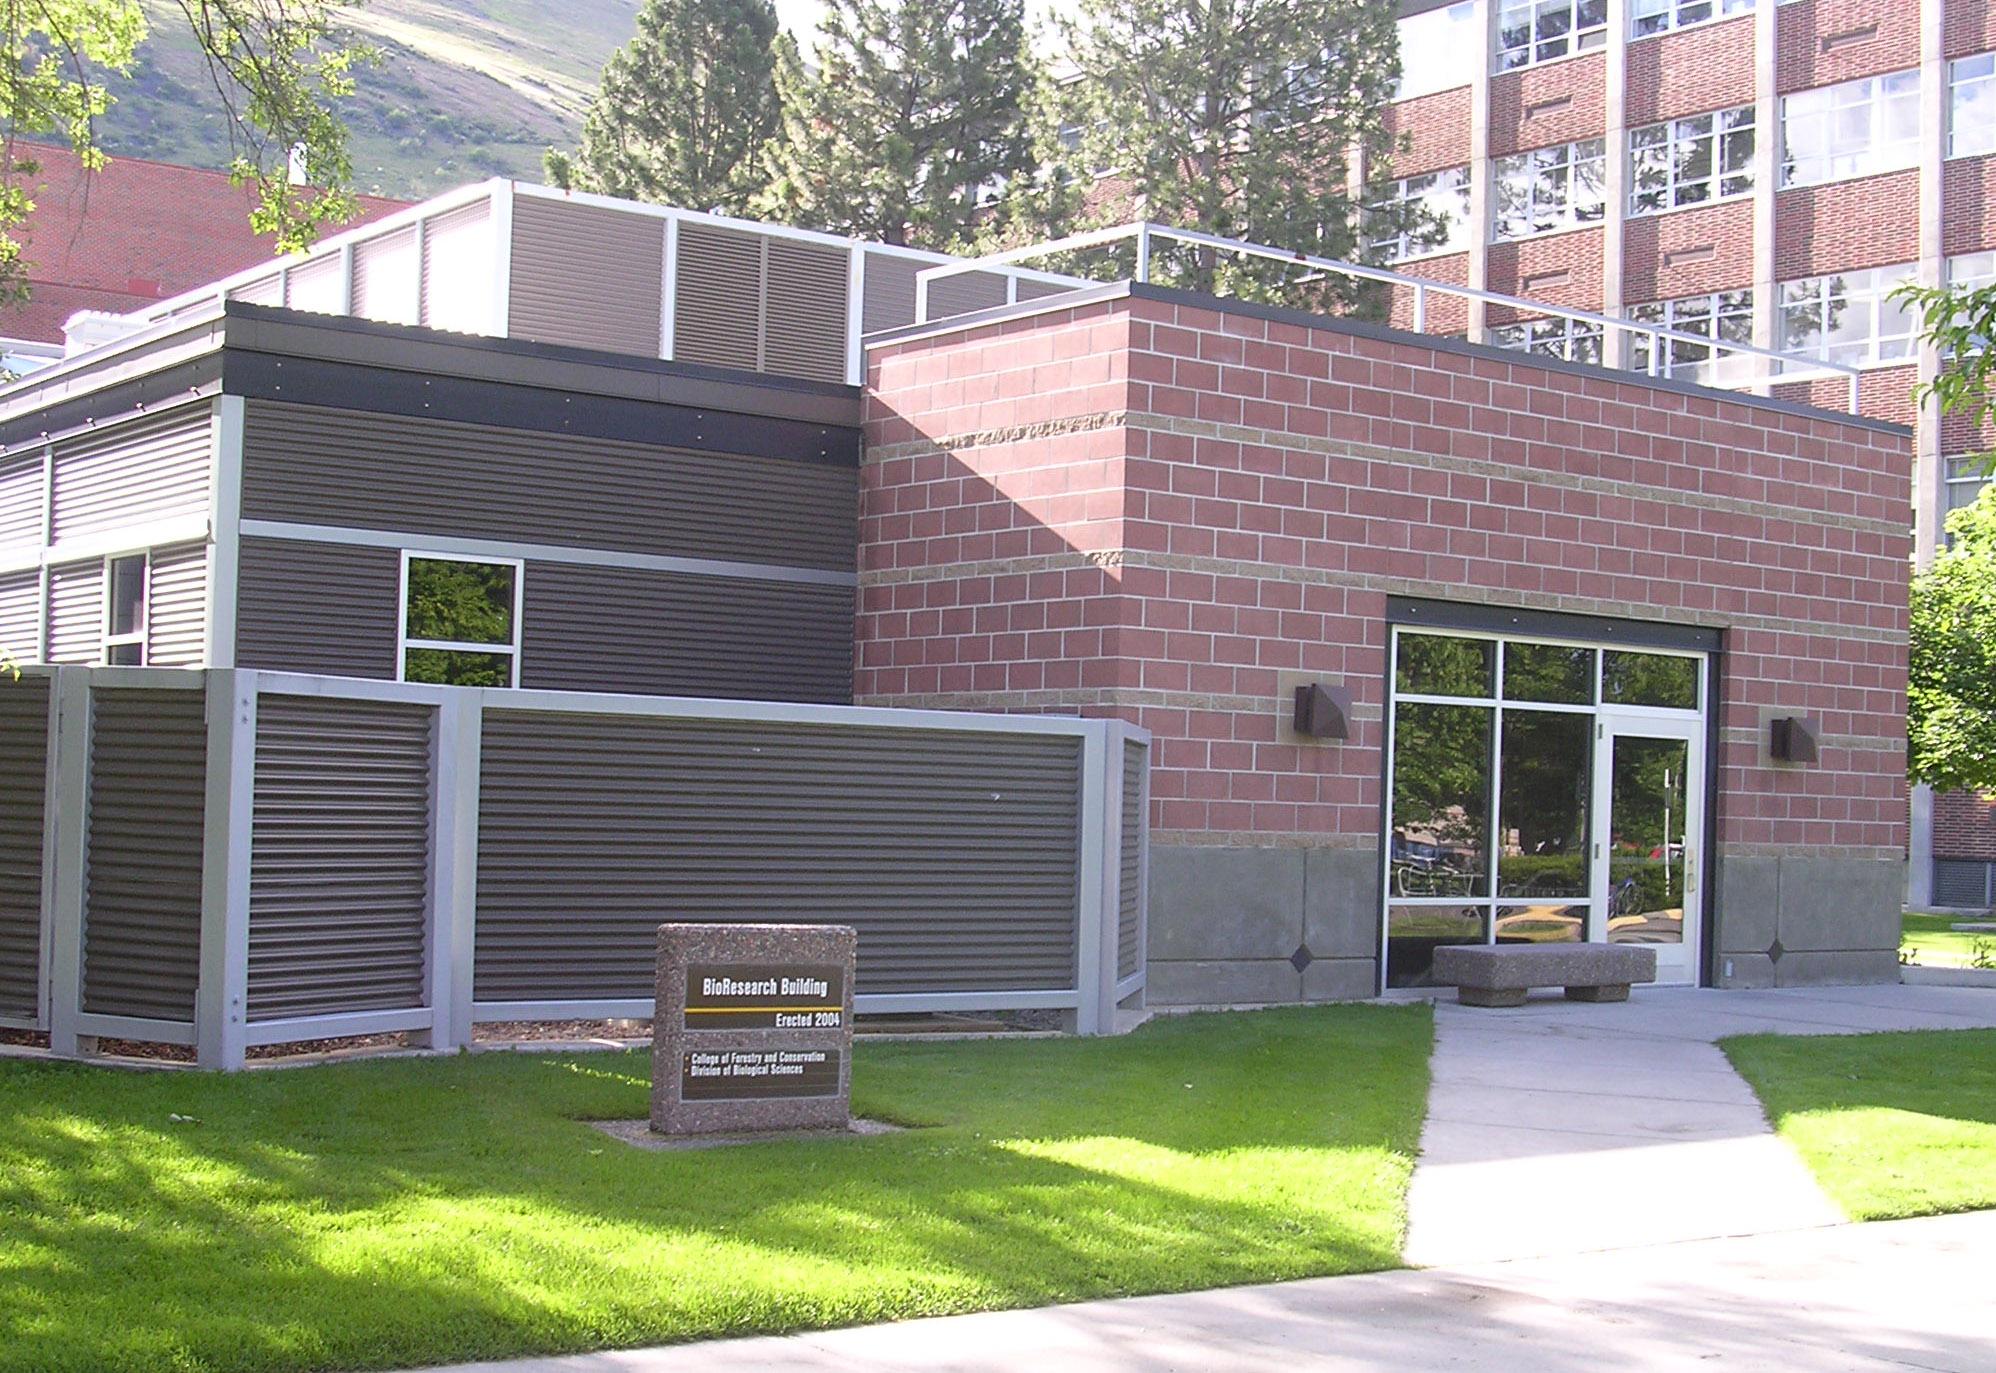 Bio Research Building